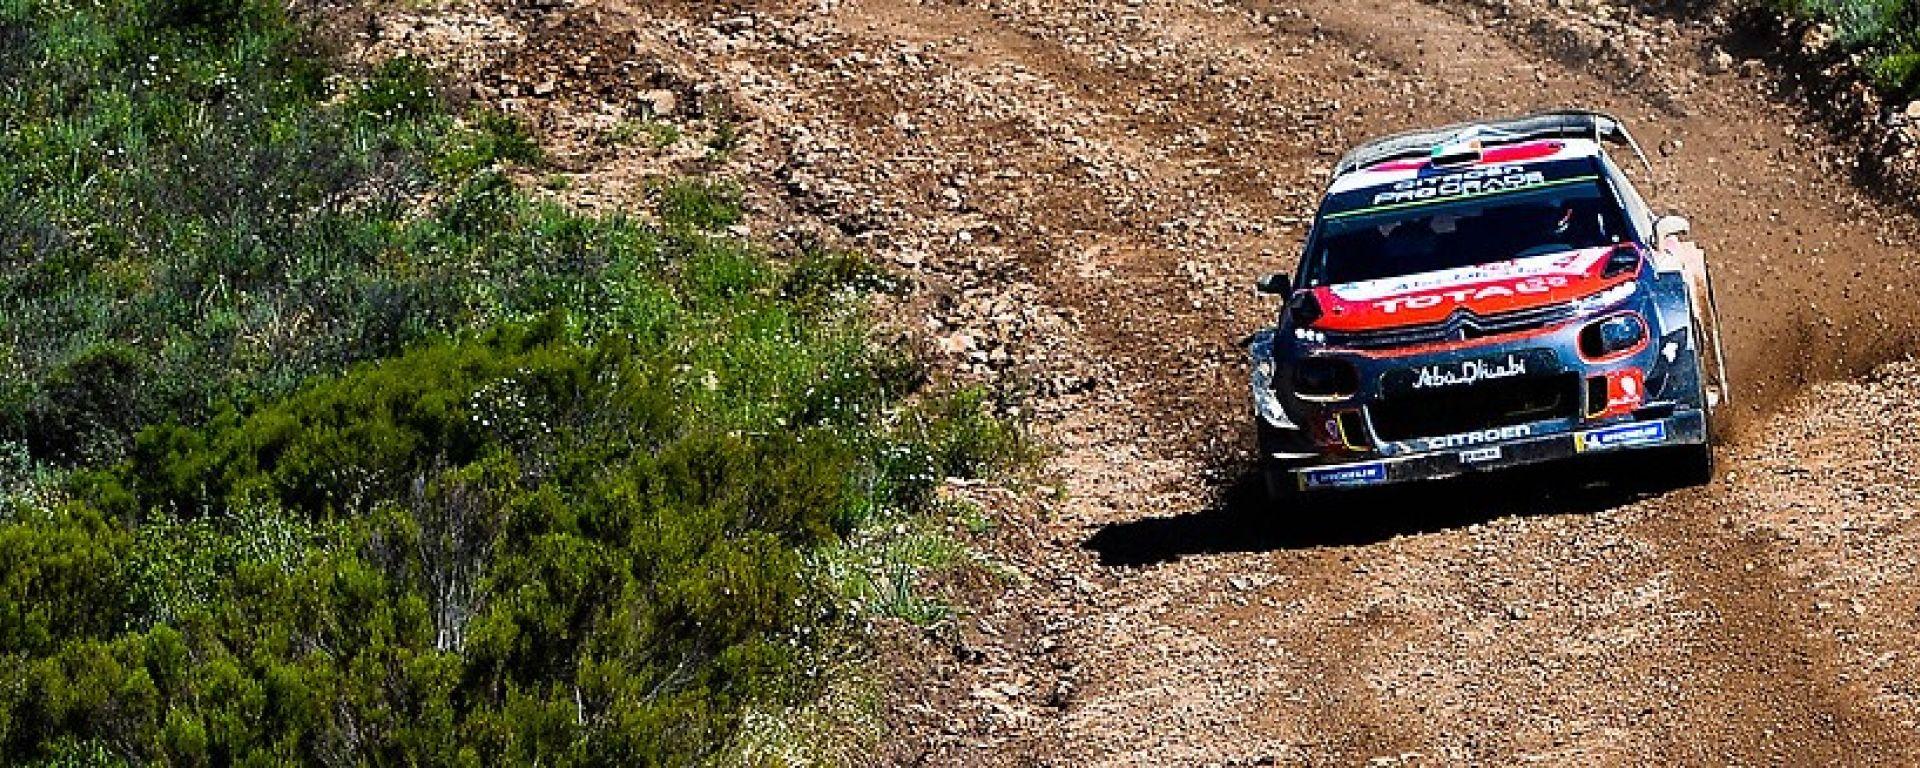 WRC 2018: Citroen al Rally di Turchia per emulare la Xsara